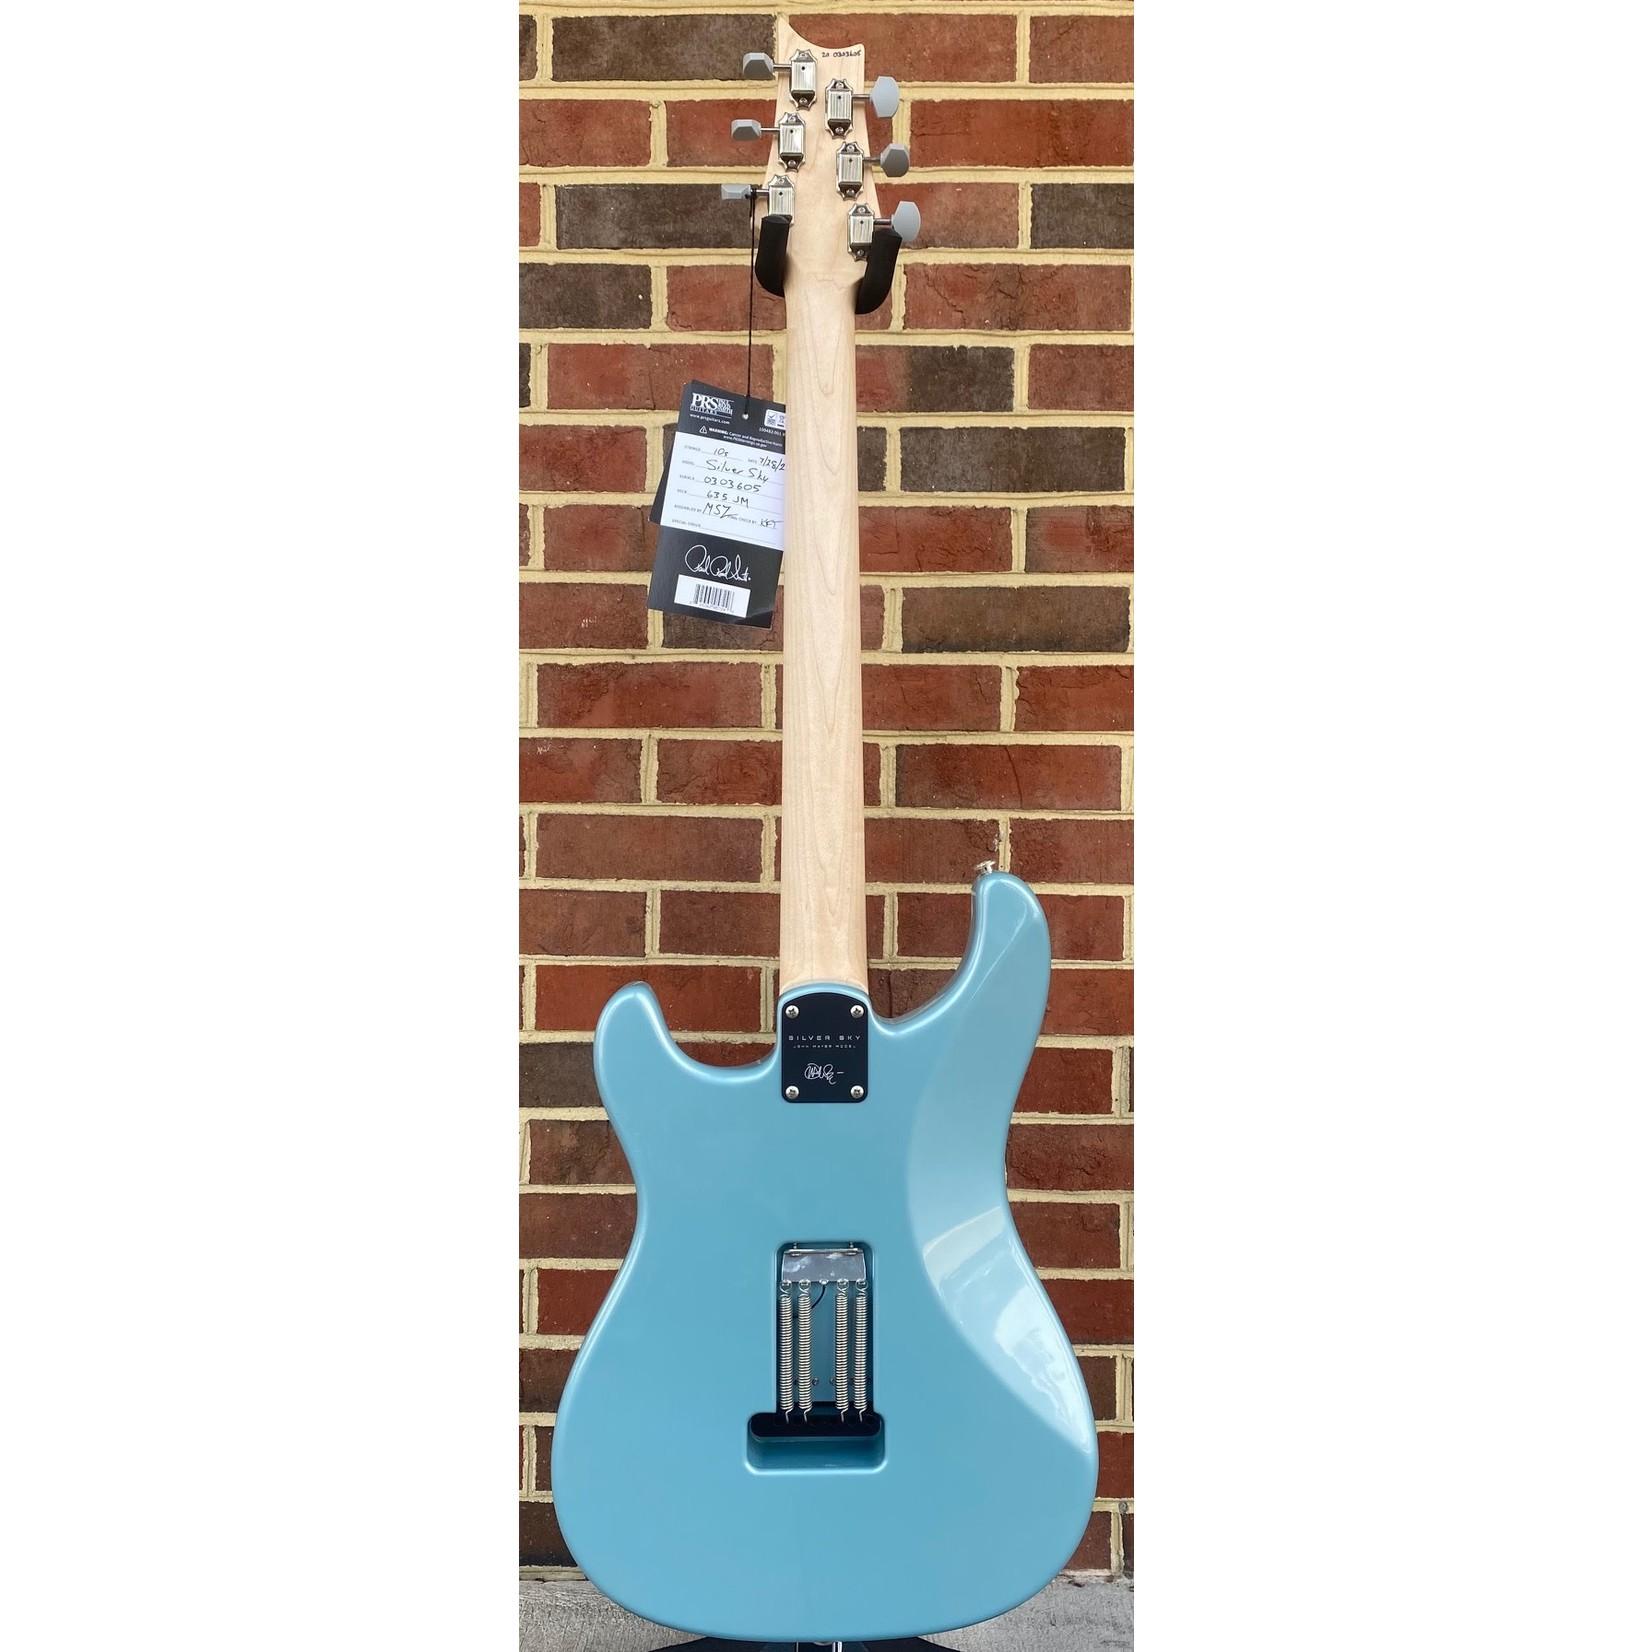 Paul Reed Smith Paul Reed Smith John Mayer Silver Sky, Polar Blue, Maple Fretboard